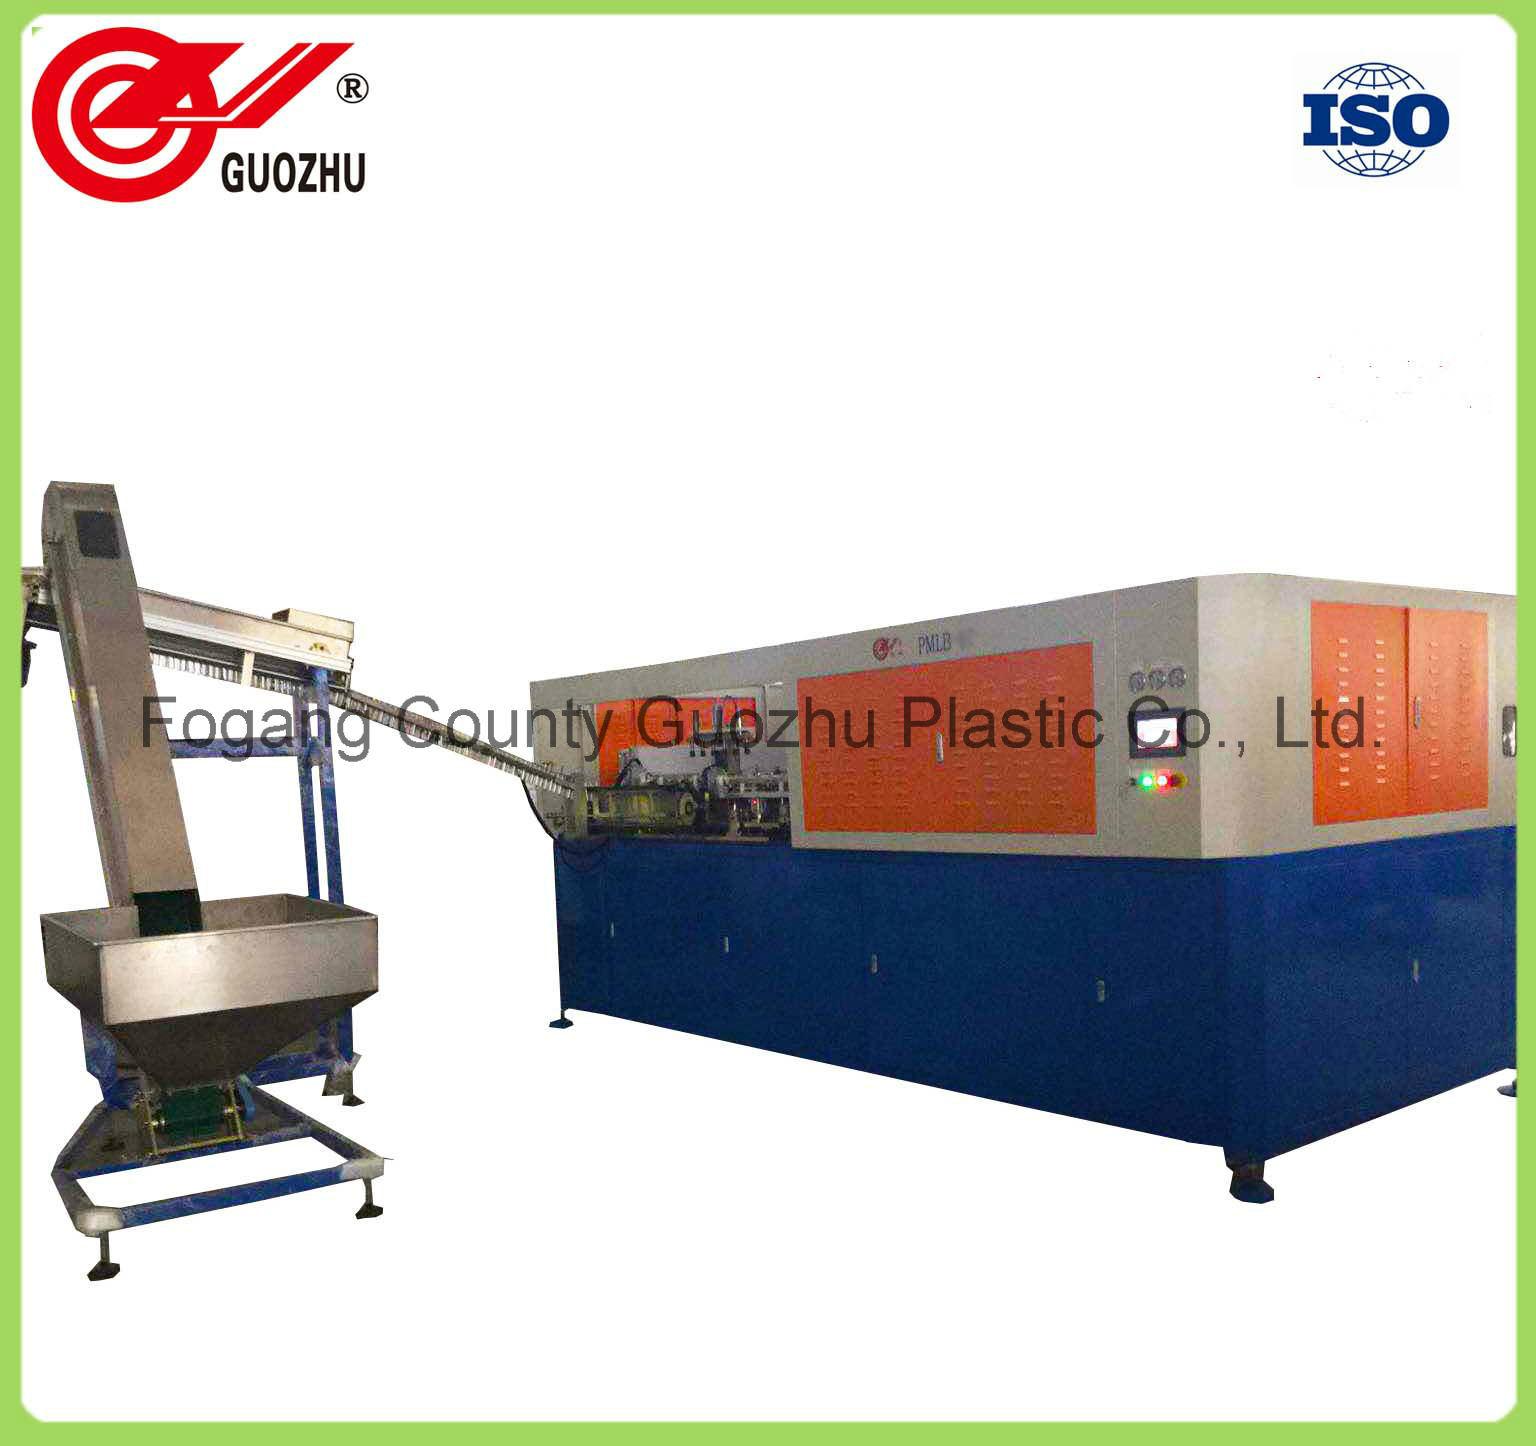 Creative Design 9000-10000bph Blow Molding Machine